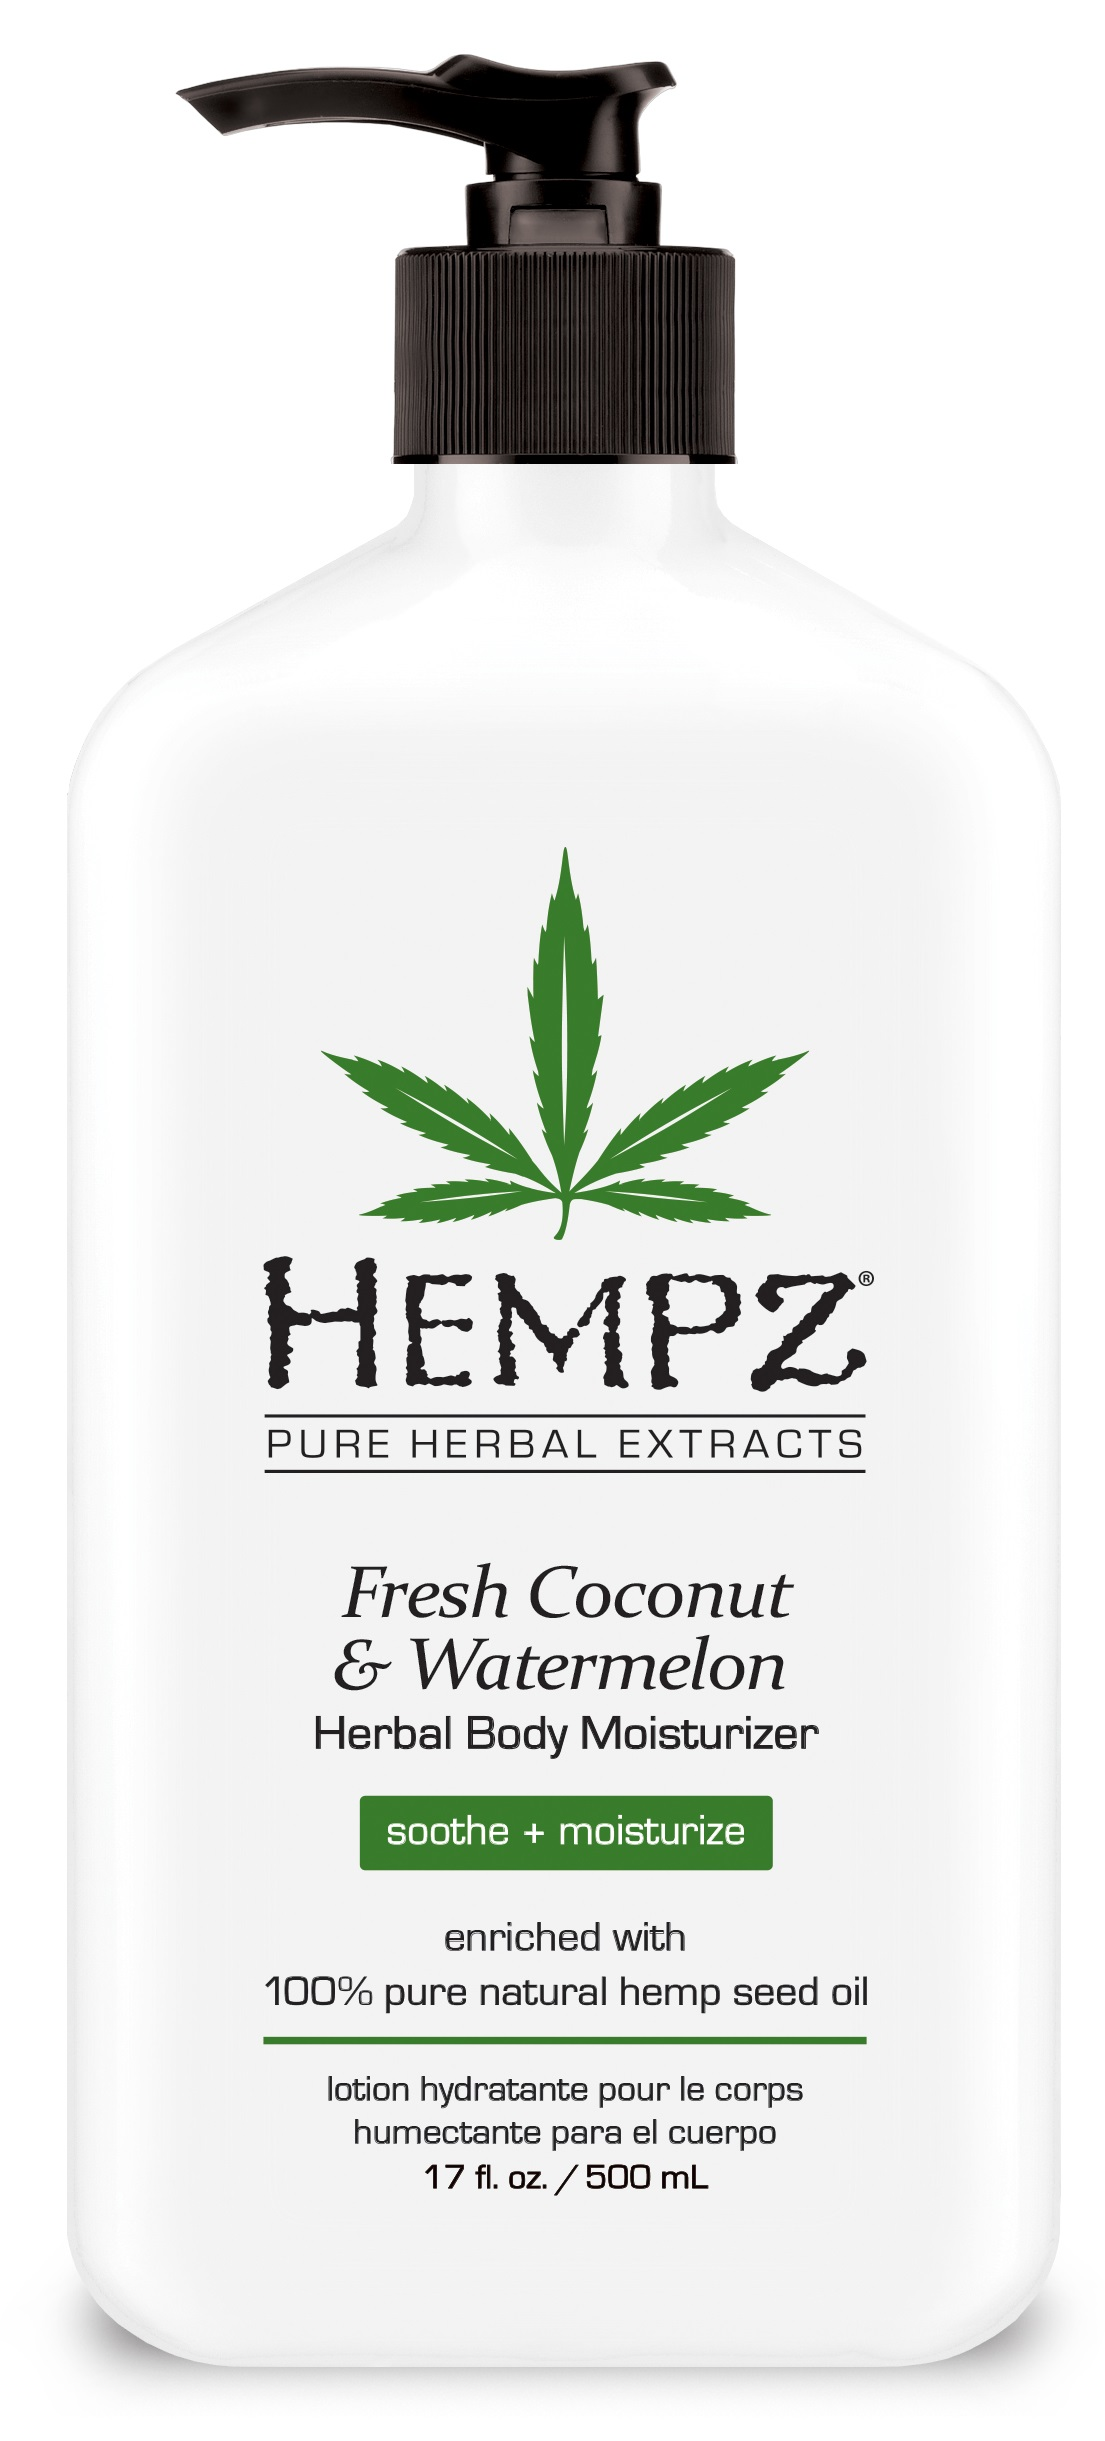 Billede af Hempz Coconut & Watermelon Herbal Body Moisturizer 500ml